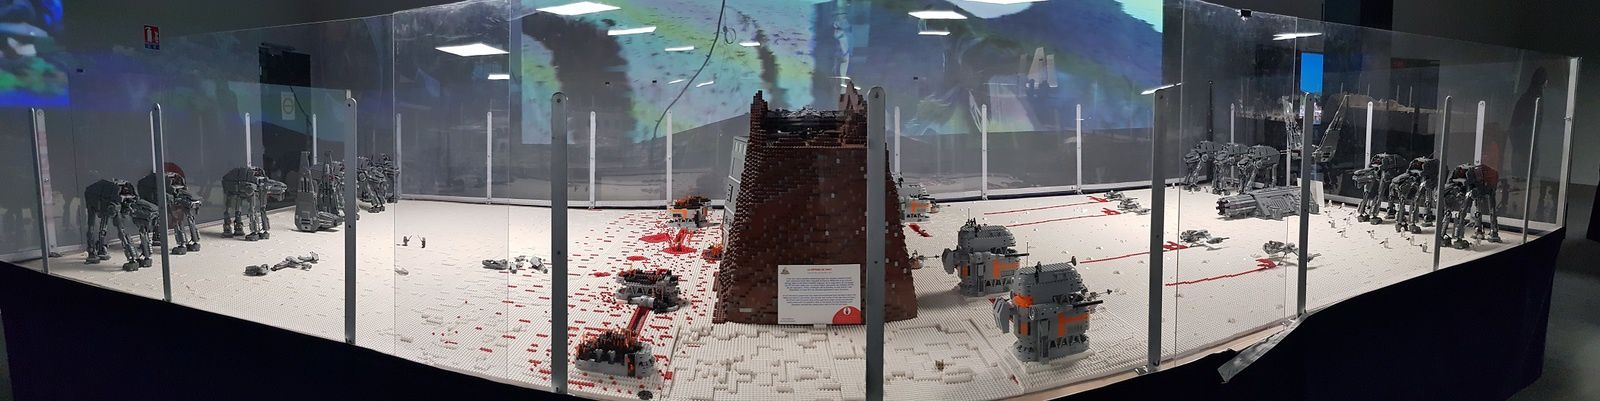 L'exposition temporaire Lego StarWars